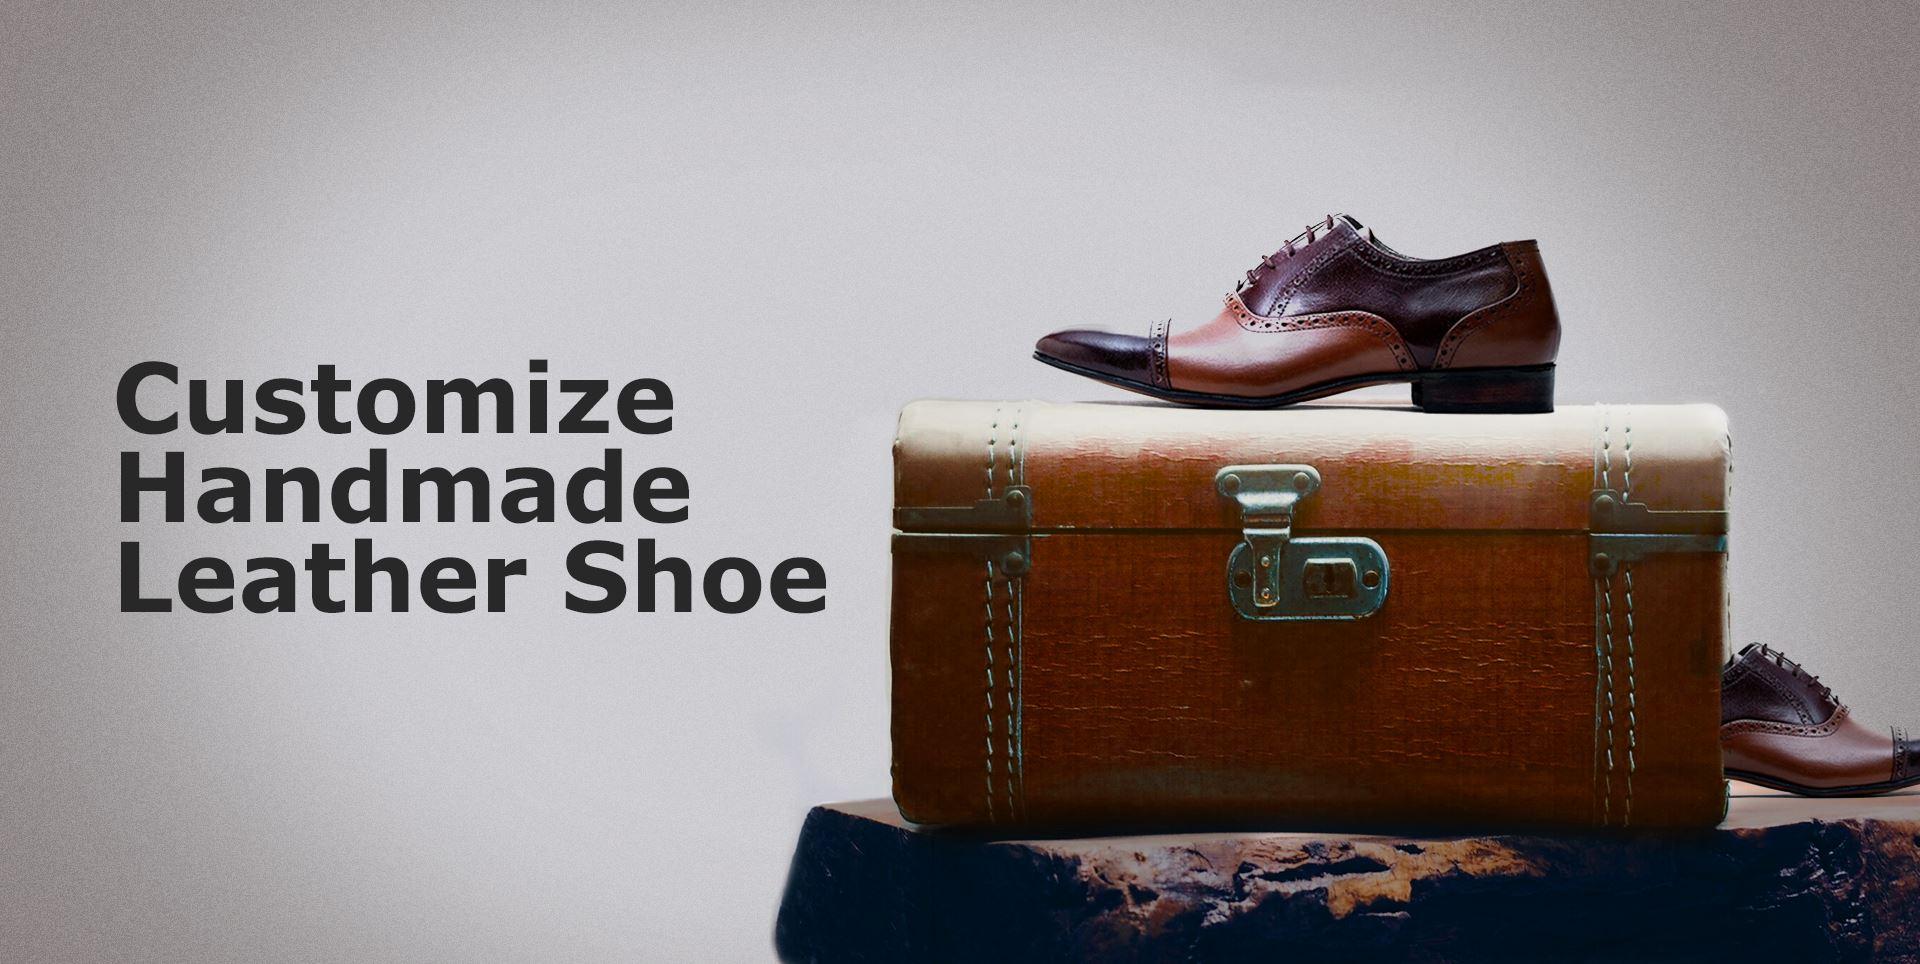 Customize Handmade Leather Shoe